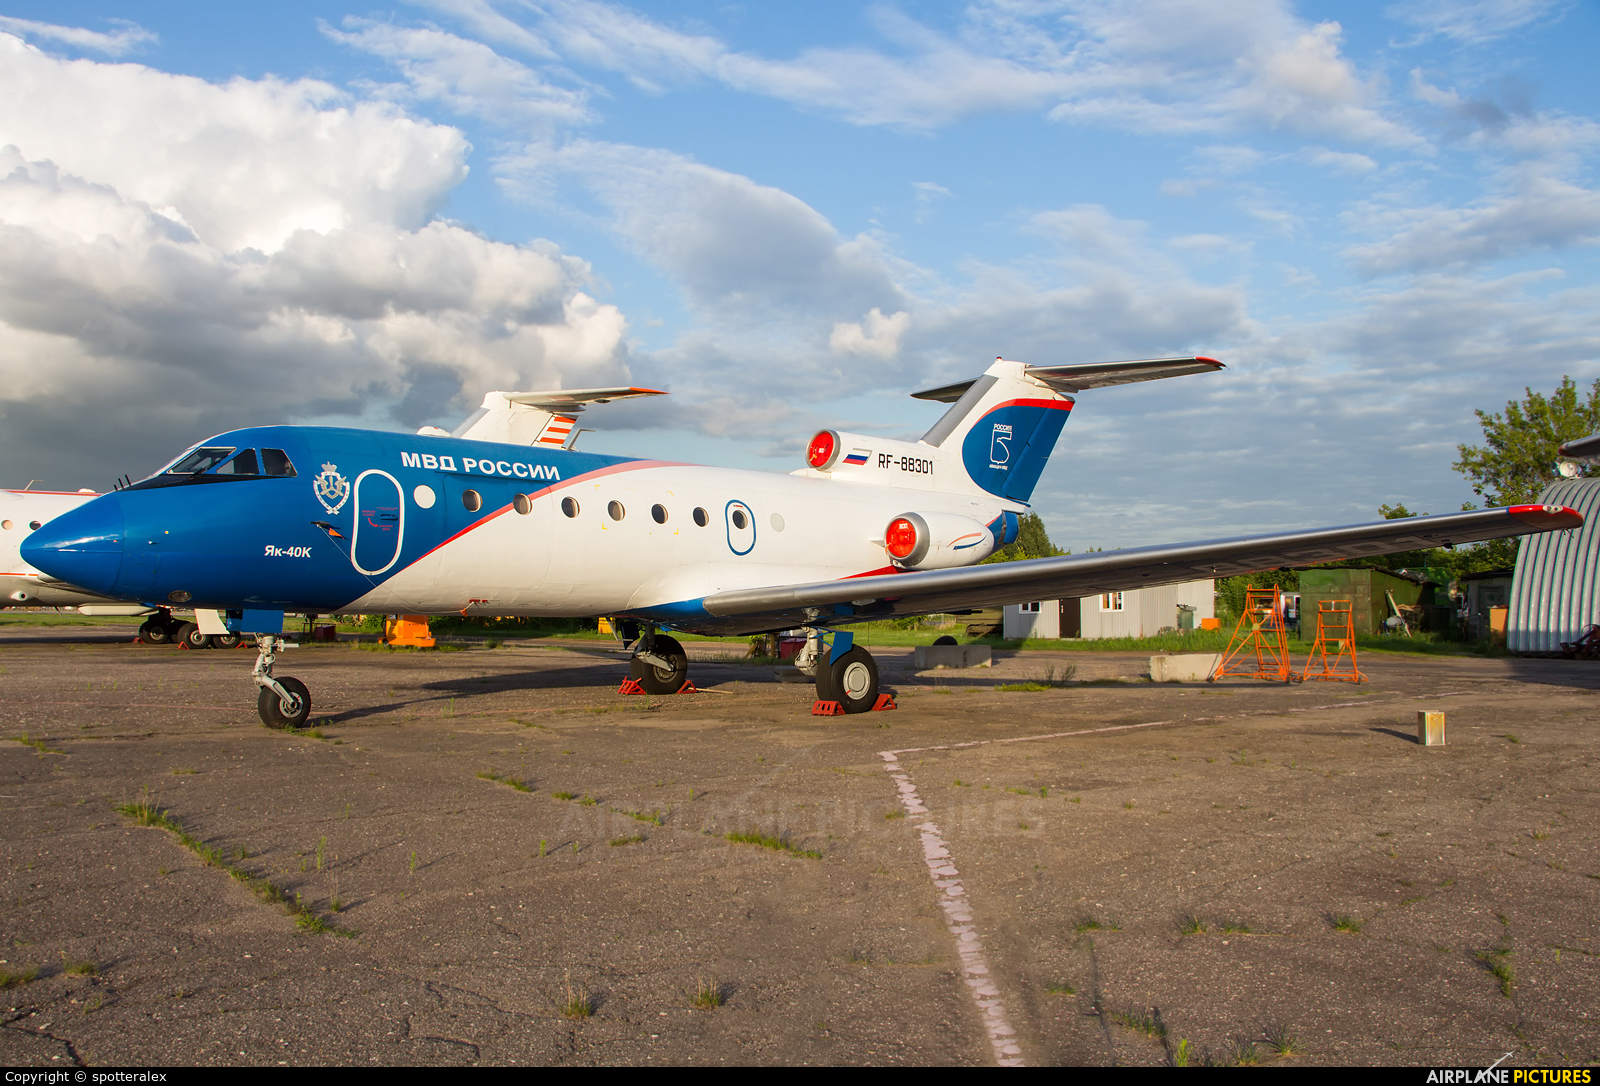 Russia - Ministry of Internal Affairs RA-88301 aircraft at Ramenskoye - Zhukovsky